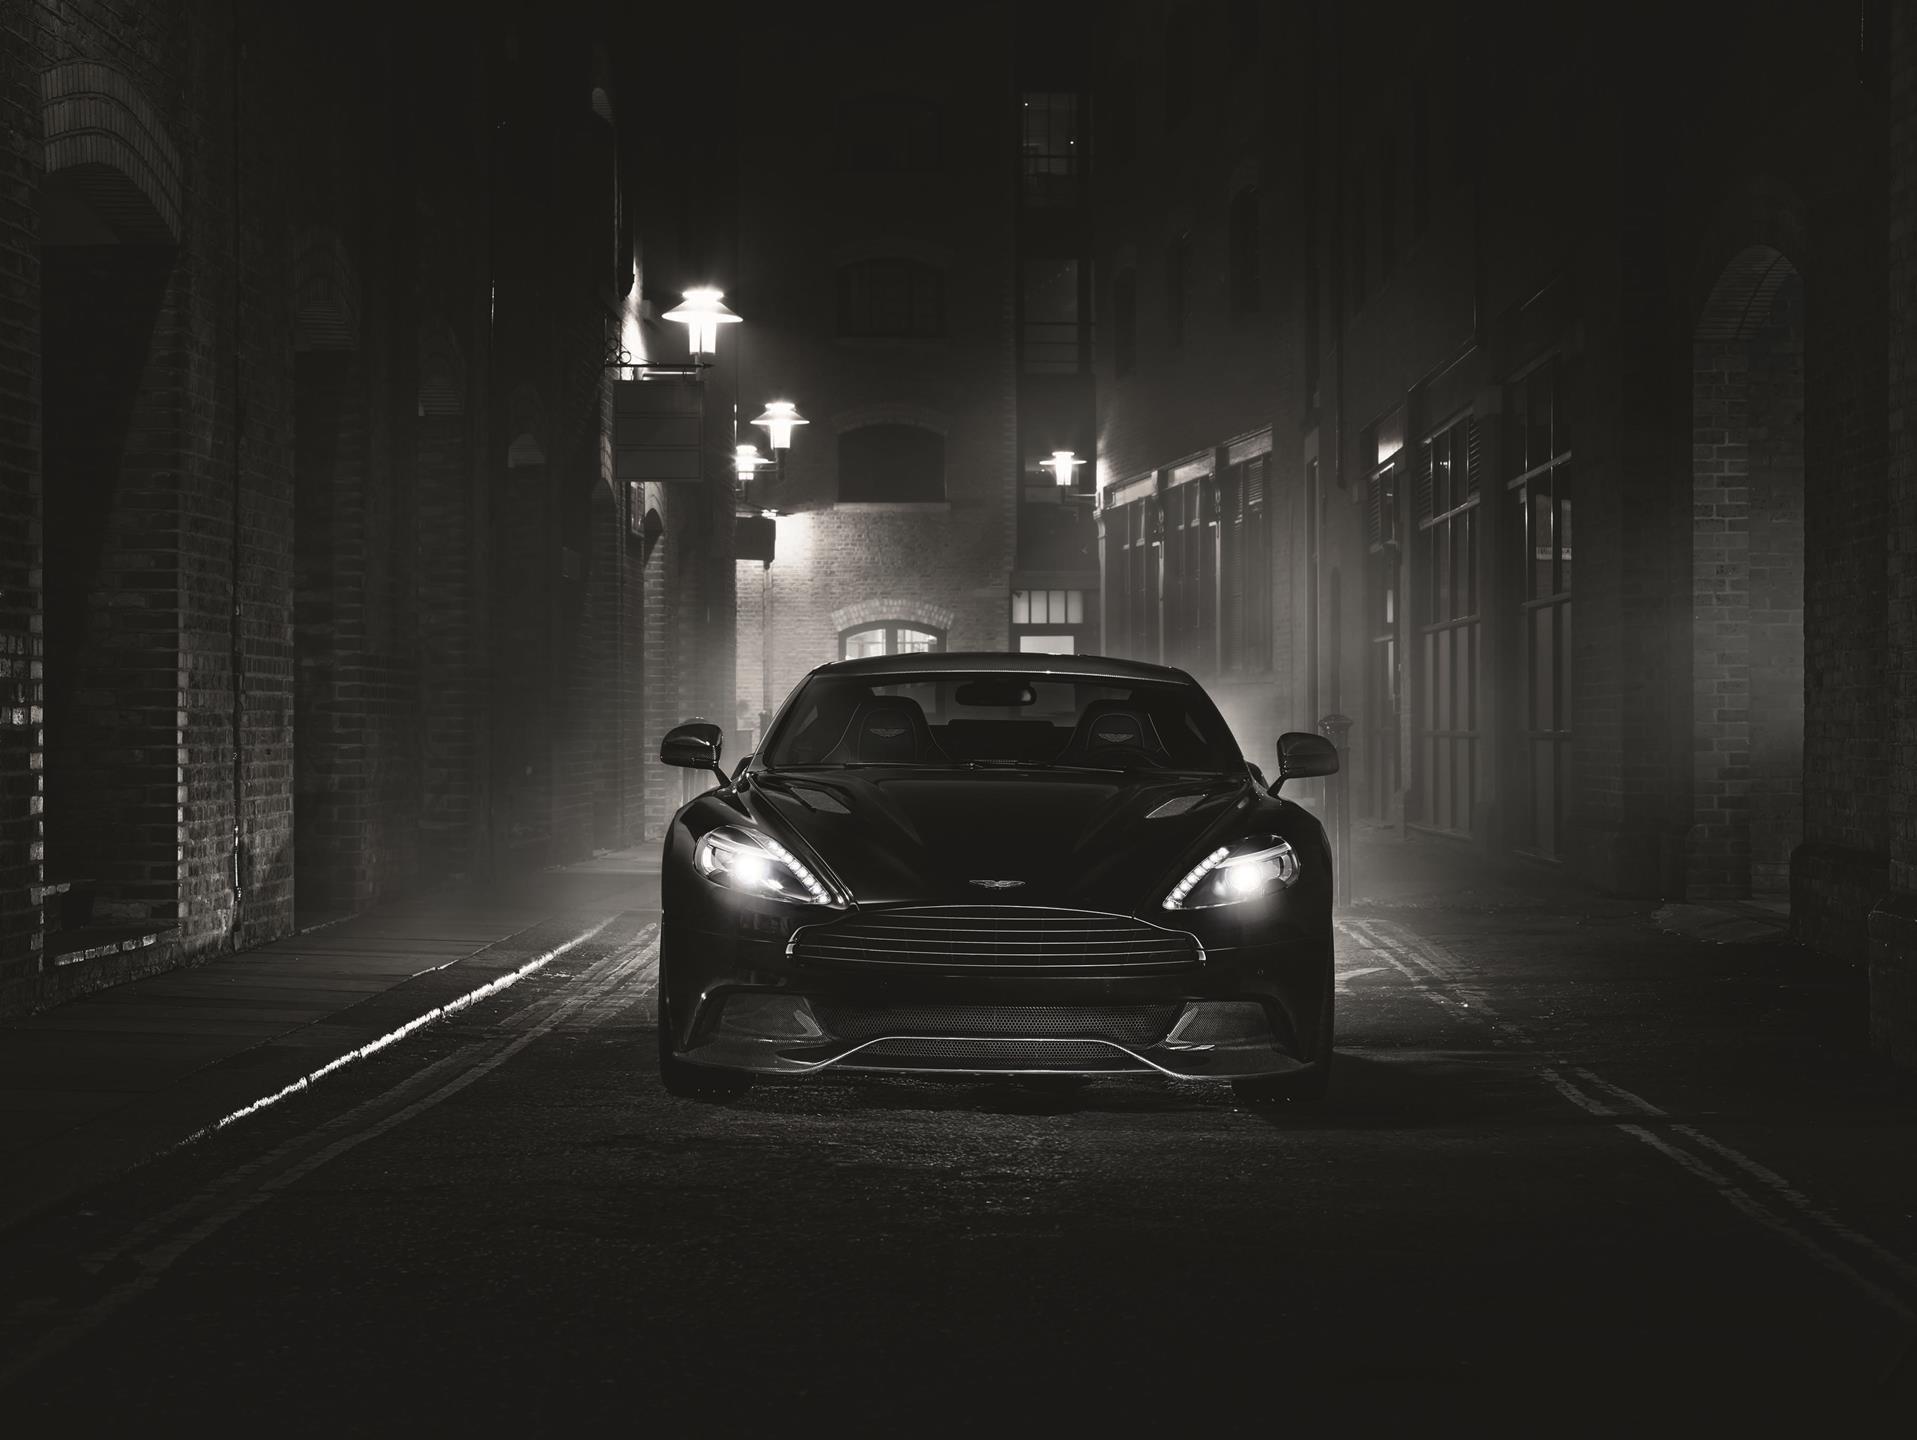 Aston Martin Vanquish Carbon Black News And Information - Aston martin vanquish black